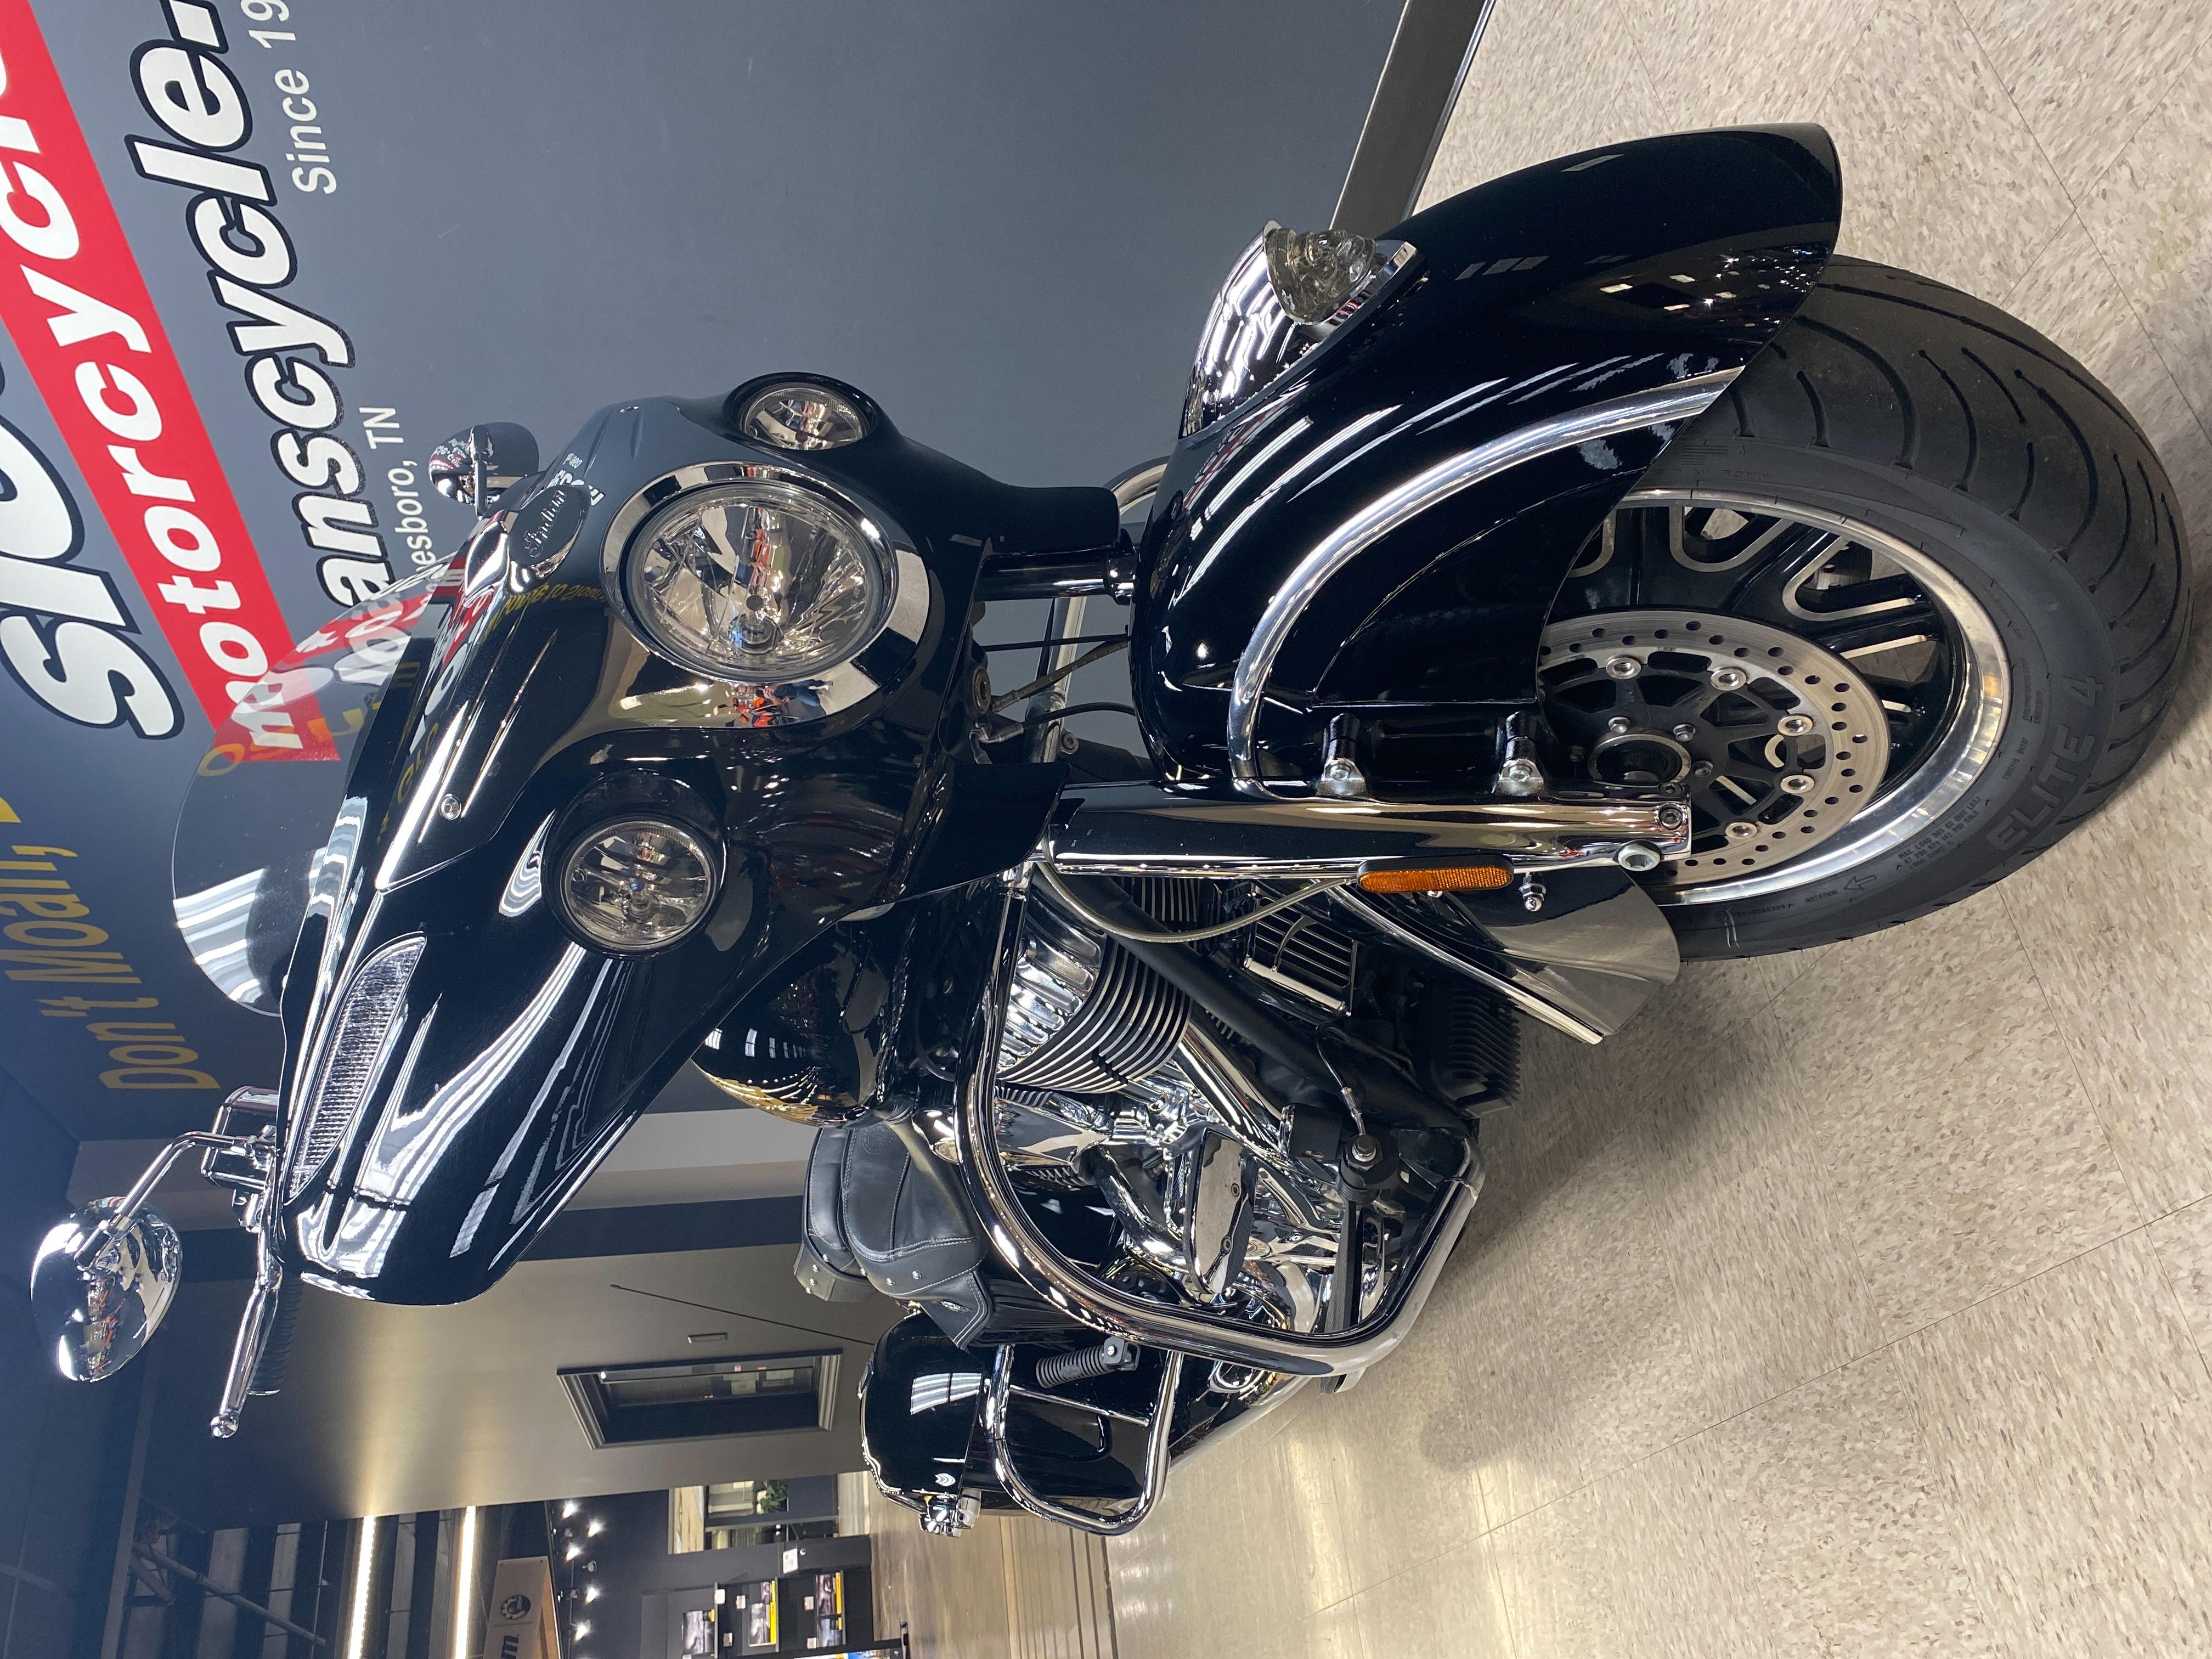 2014 Indian Chieftain Base at Sloans Motorcycle ATV, Murfreesboro, TN, 37129